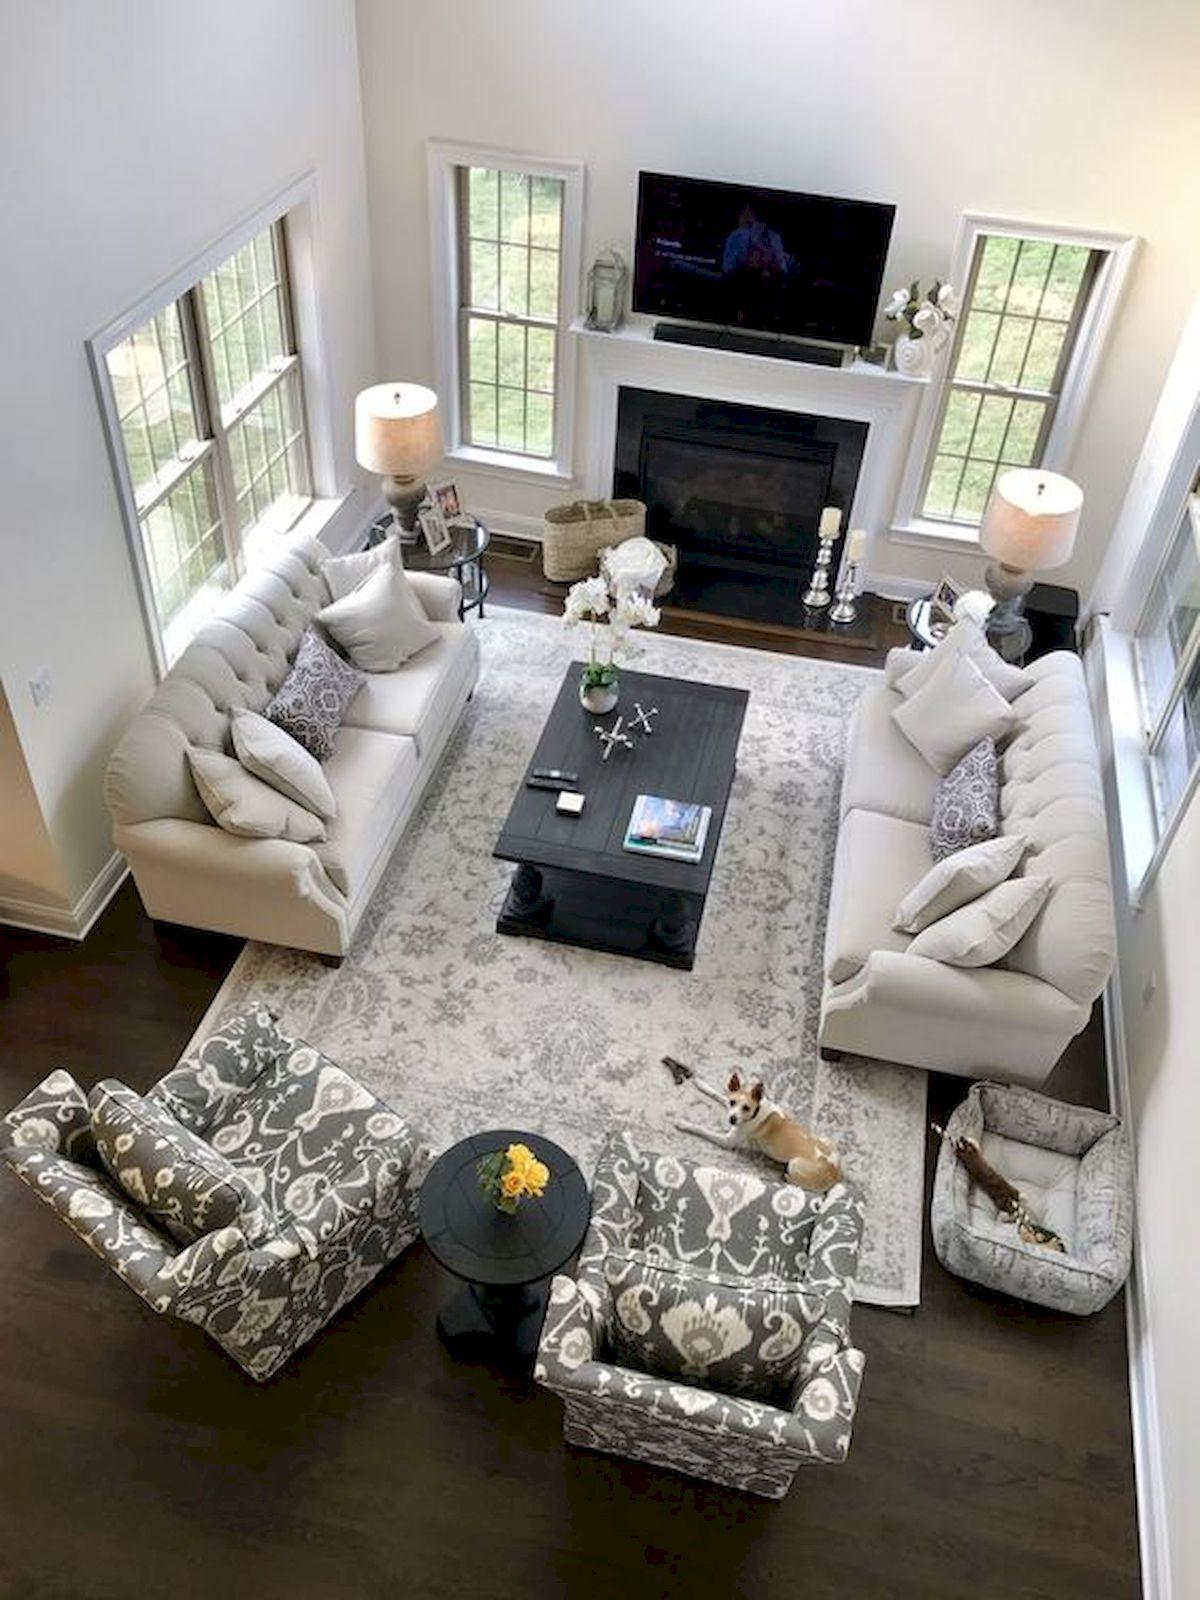 50 Gorgeous Living Room Decor and Design Ideas (17)